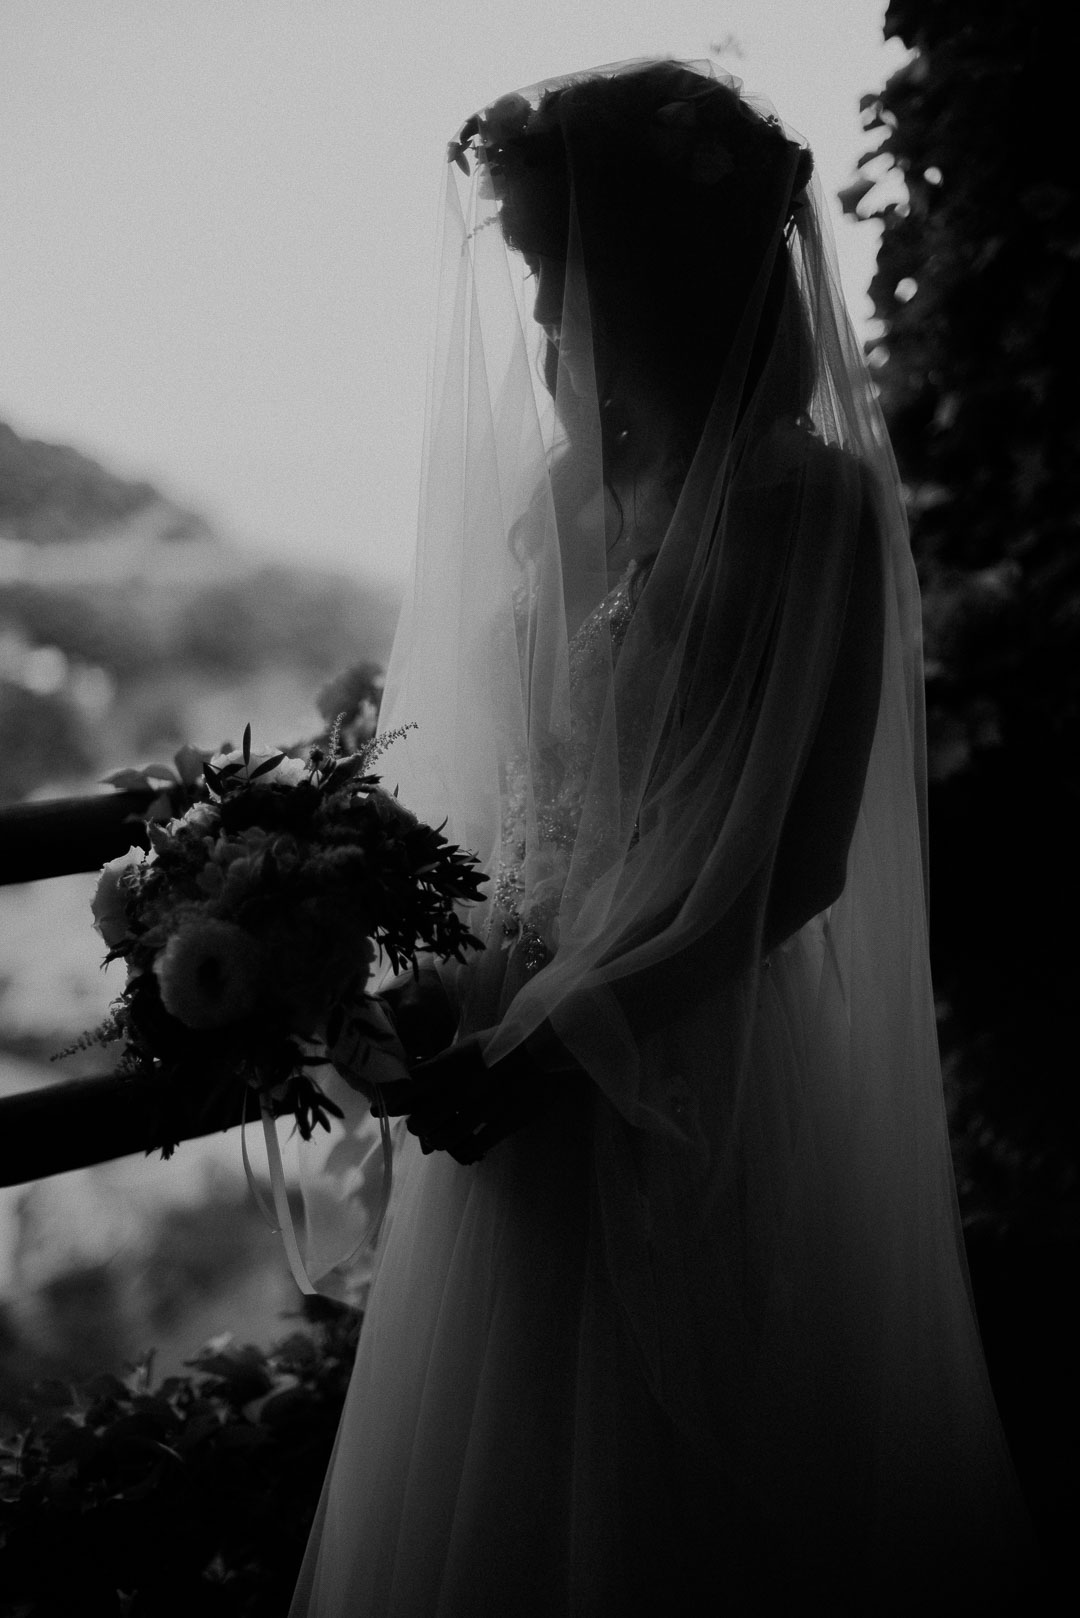 wedding-photographer-destination-fineart-bespoke-reportage-amalficoast-torrelacerniola-vivianeizzo-spazio46-54